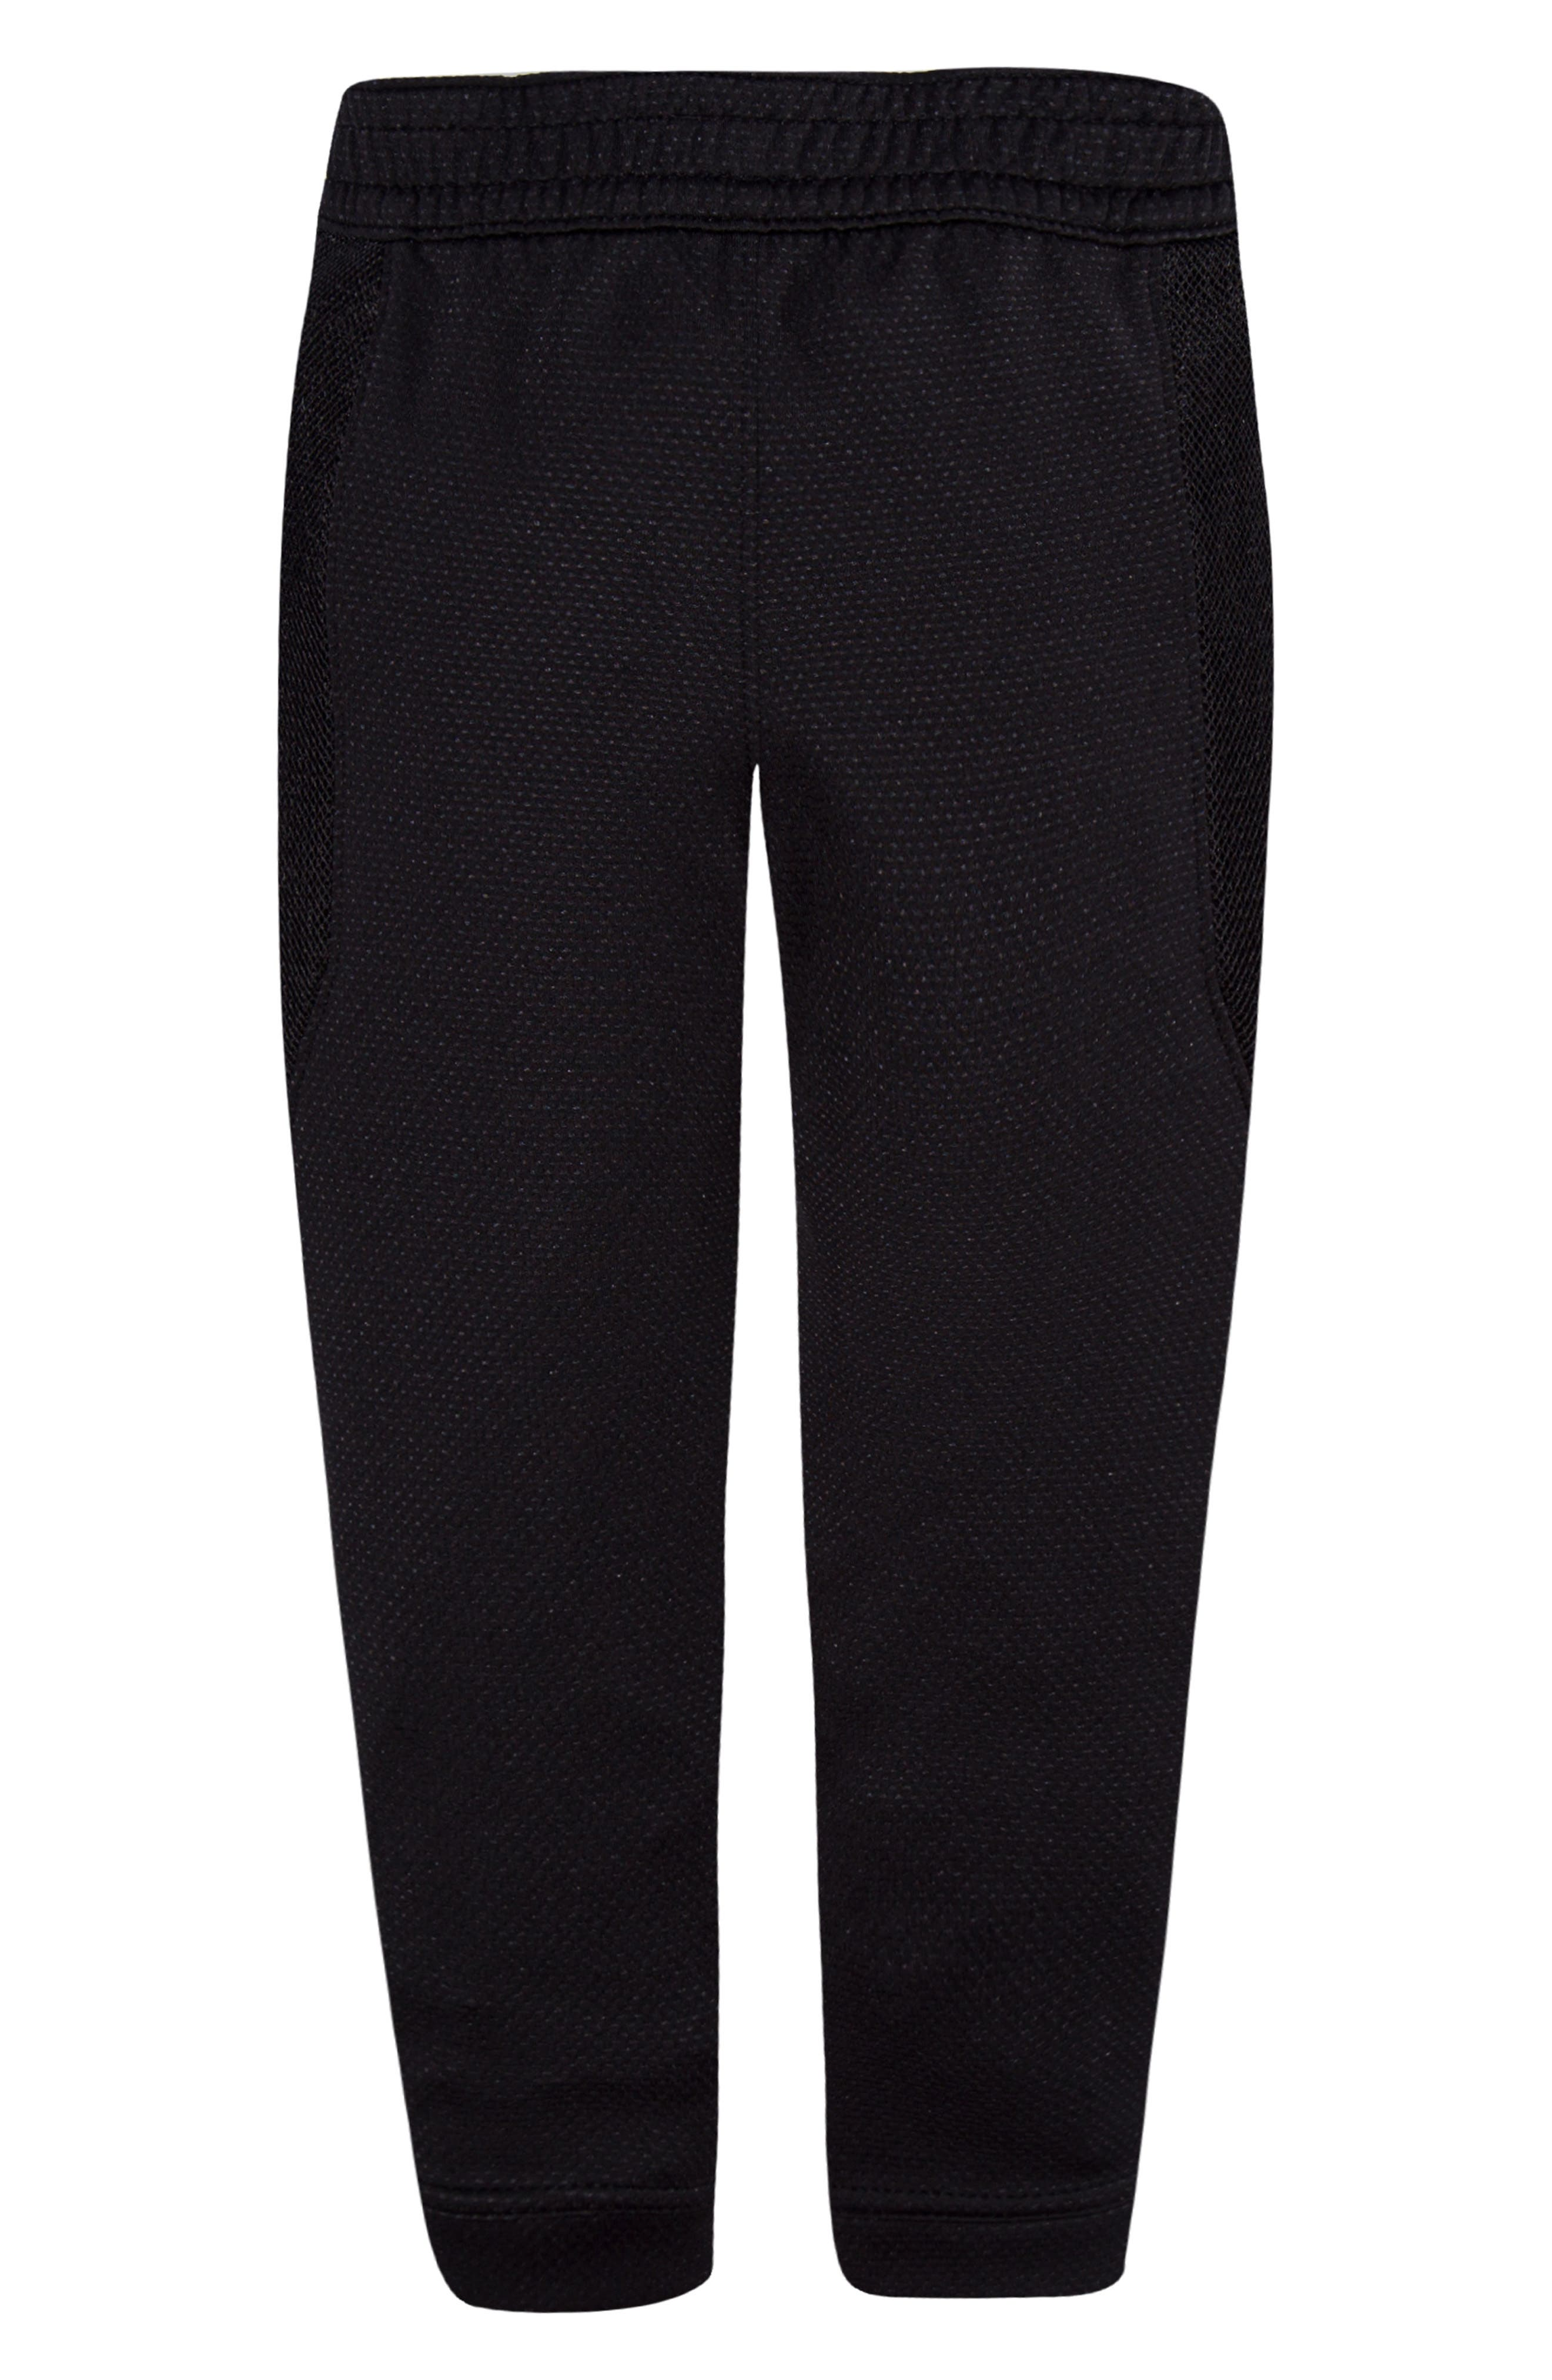 Therma Flex Track Pants,                             Alternate thumbnail 2, color,                             BLACK